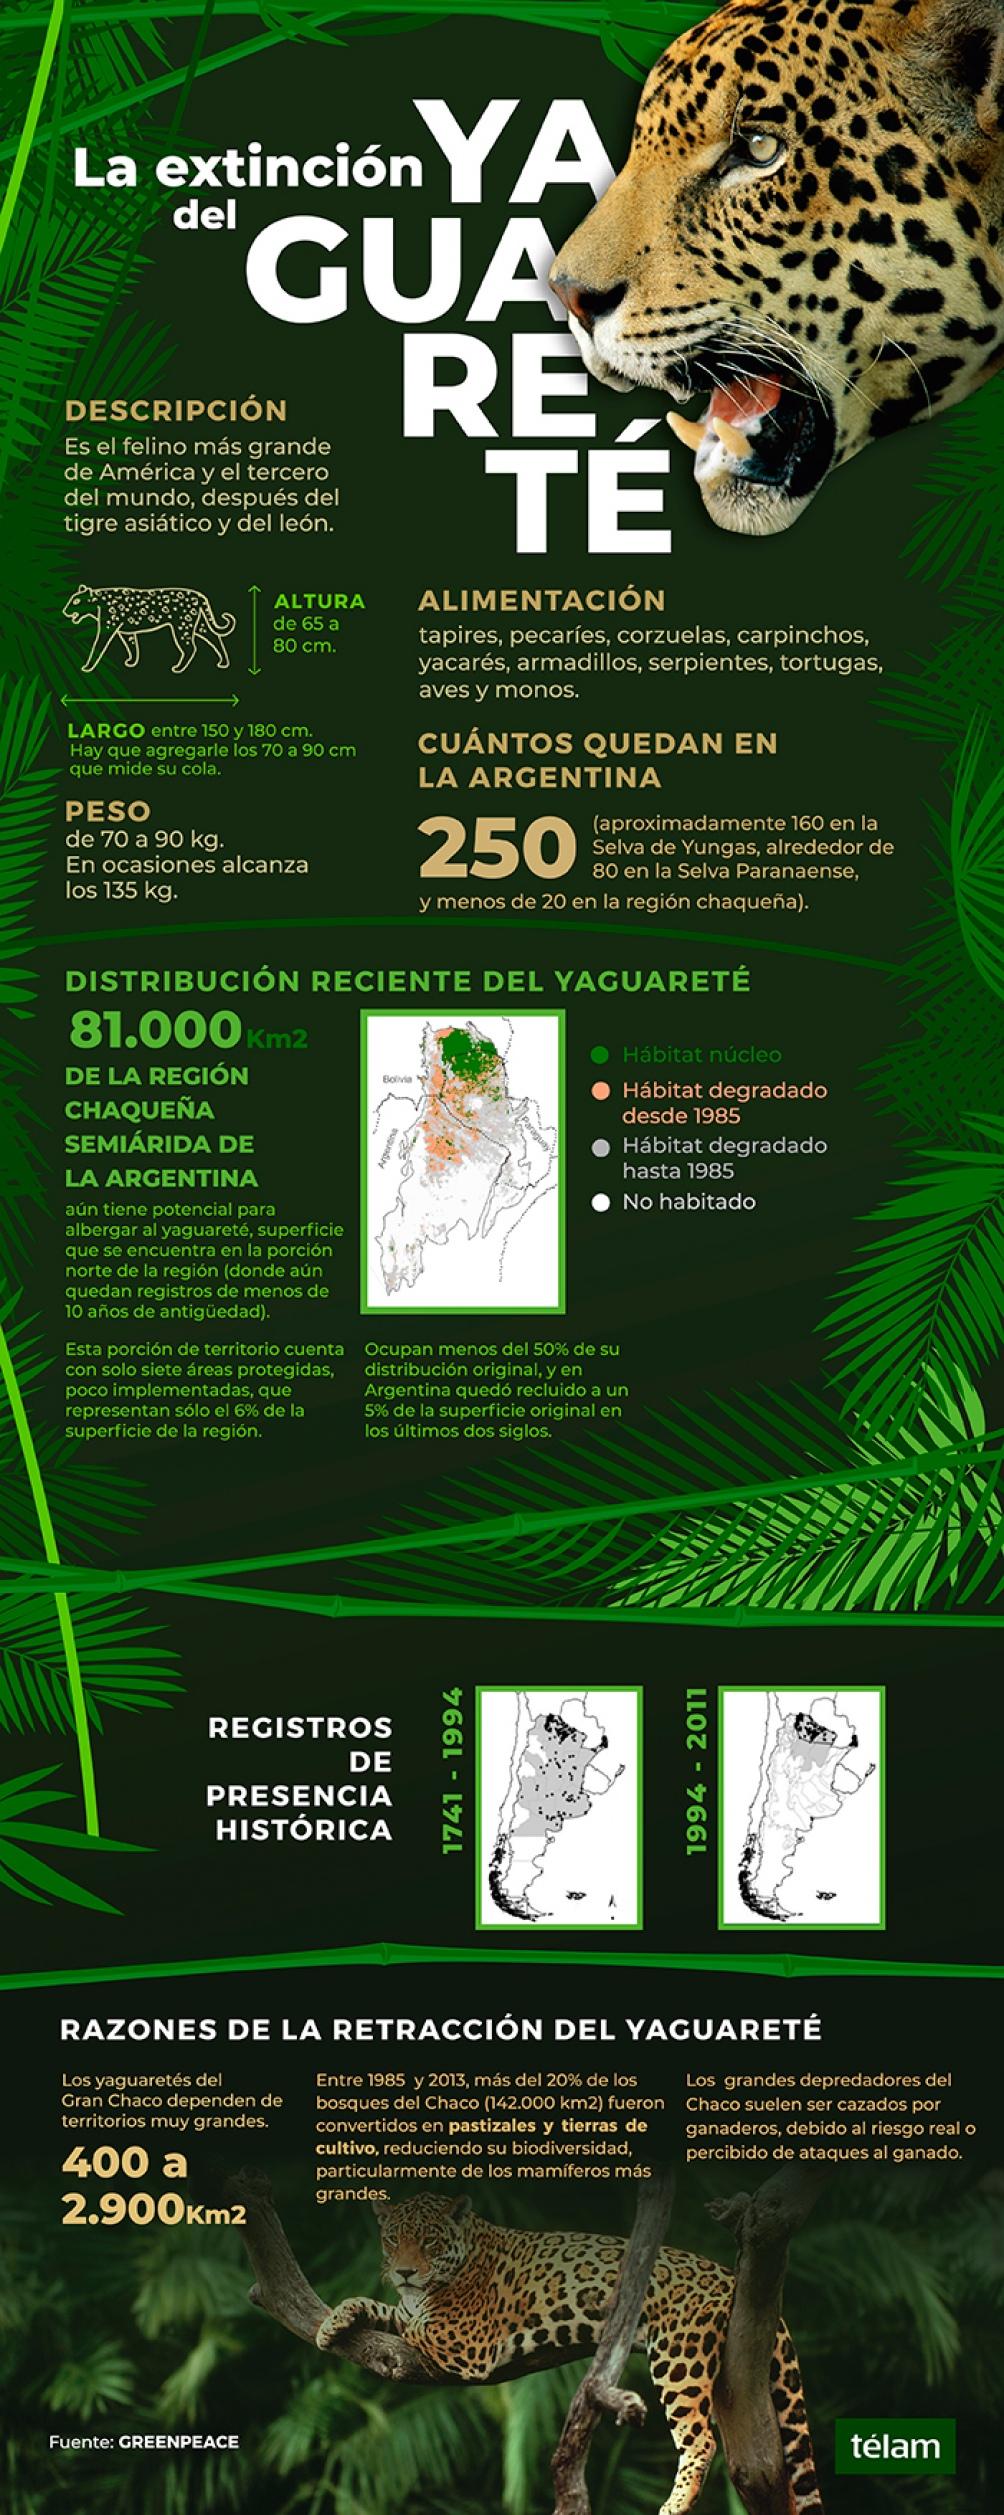 El Dia Internacional del Yaguareté se celebra desde 2018.